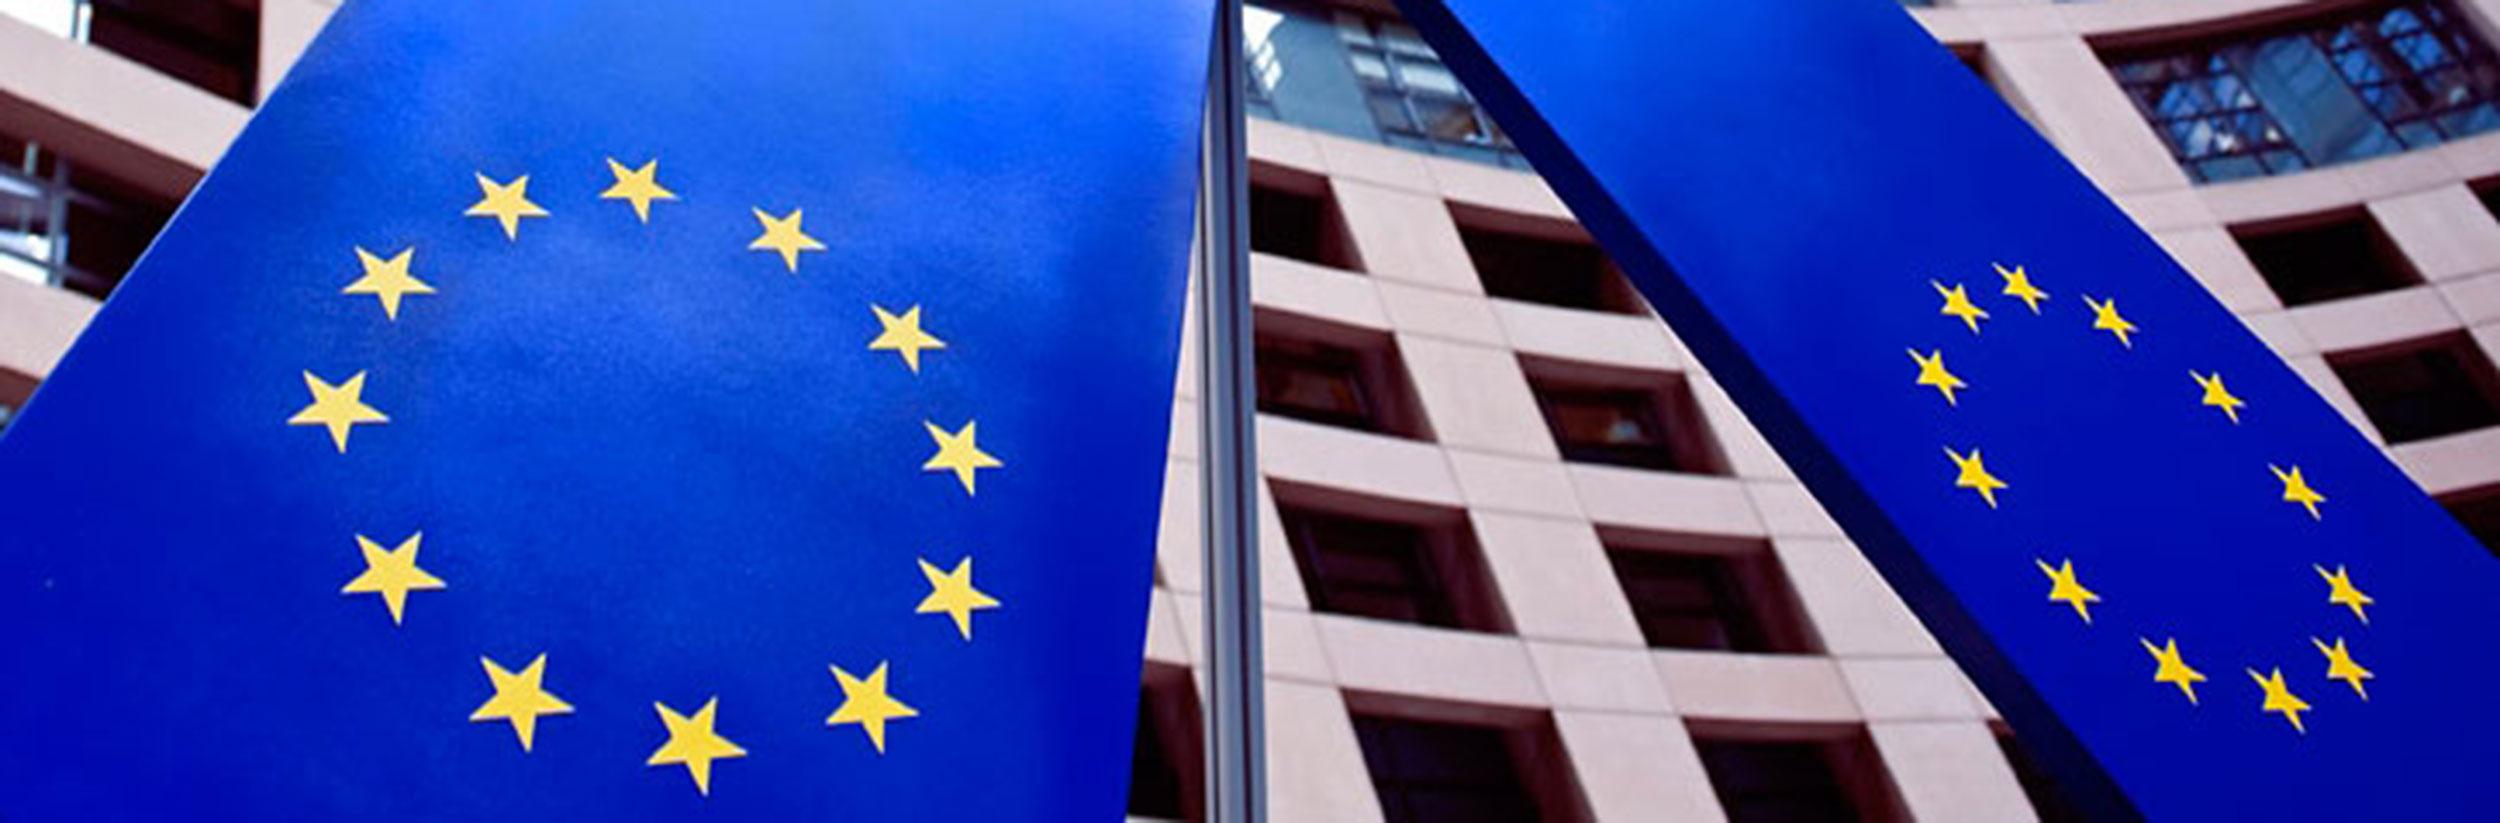 H_EUROPA